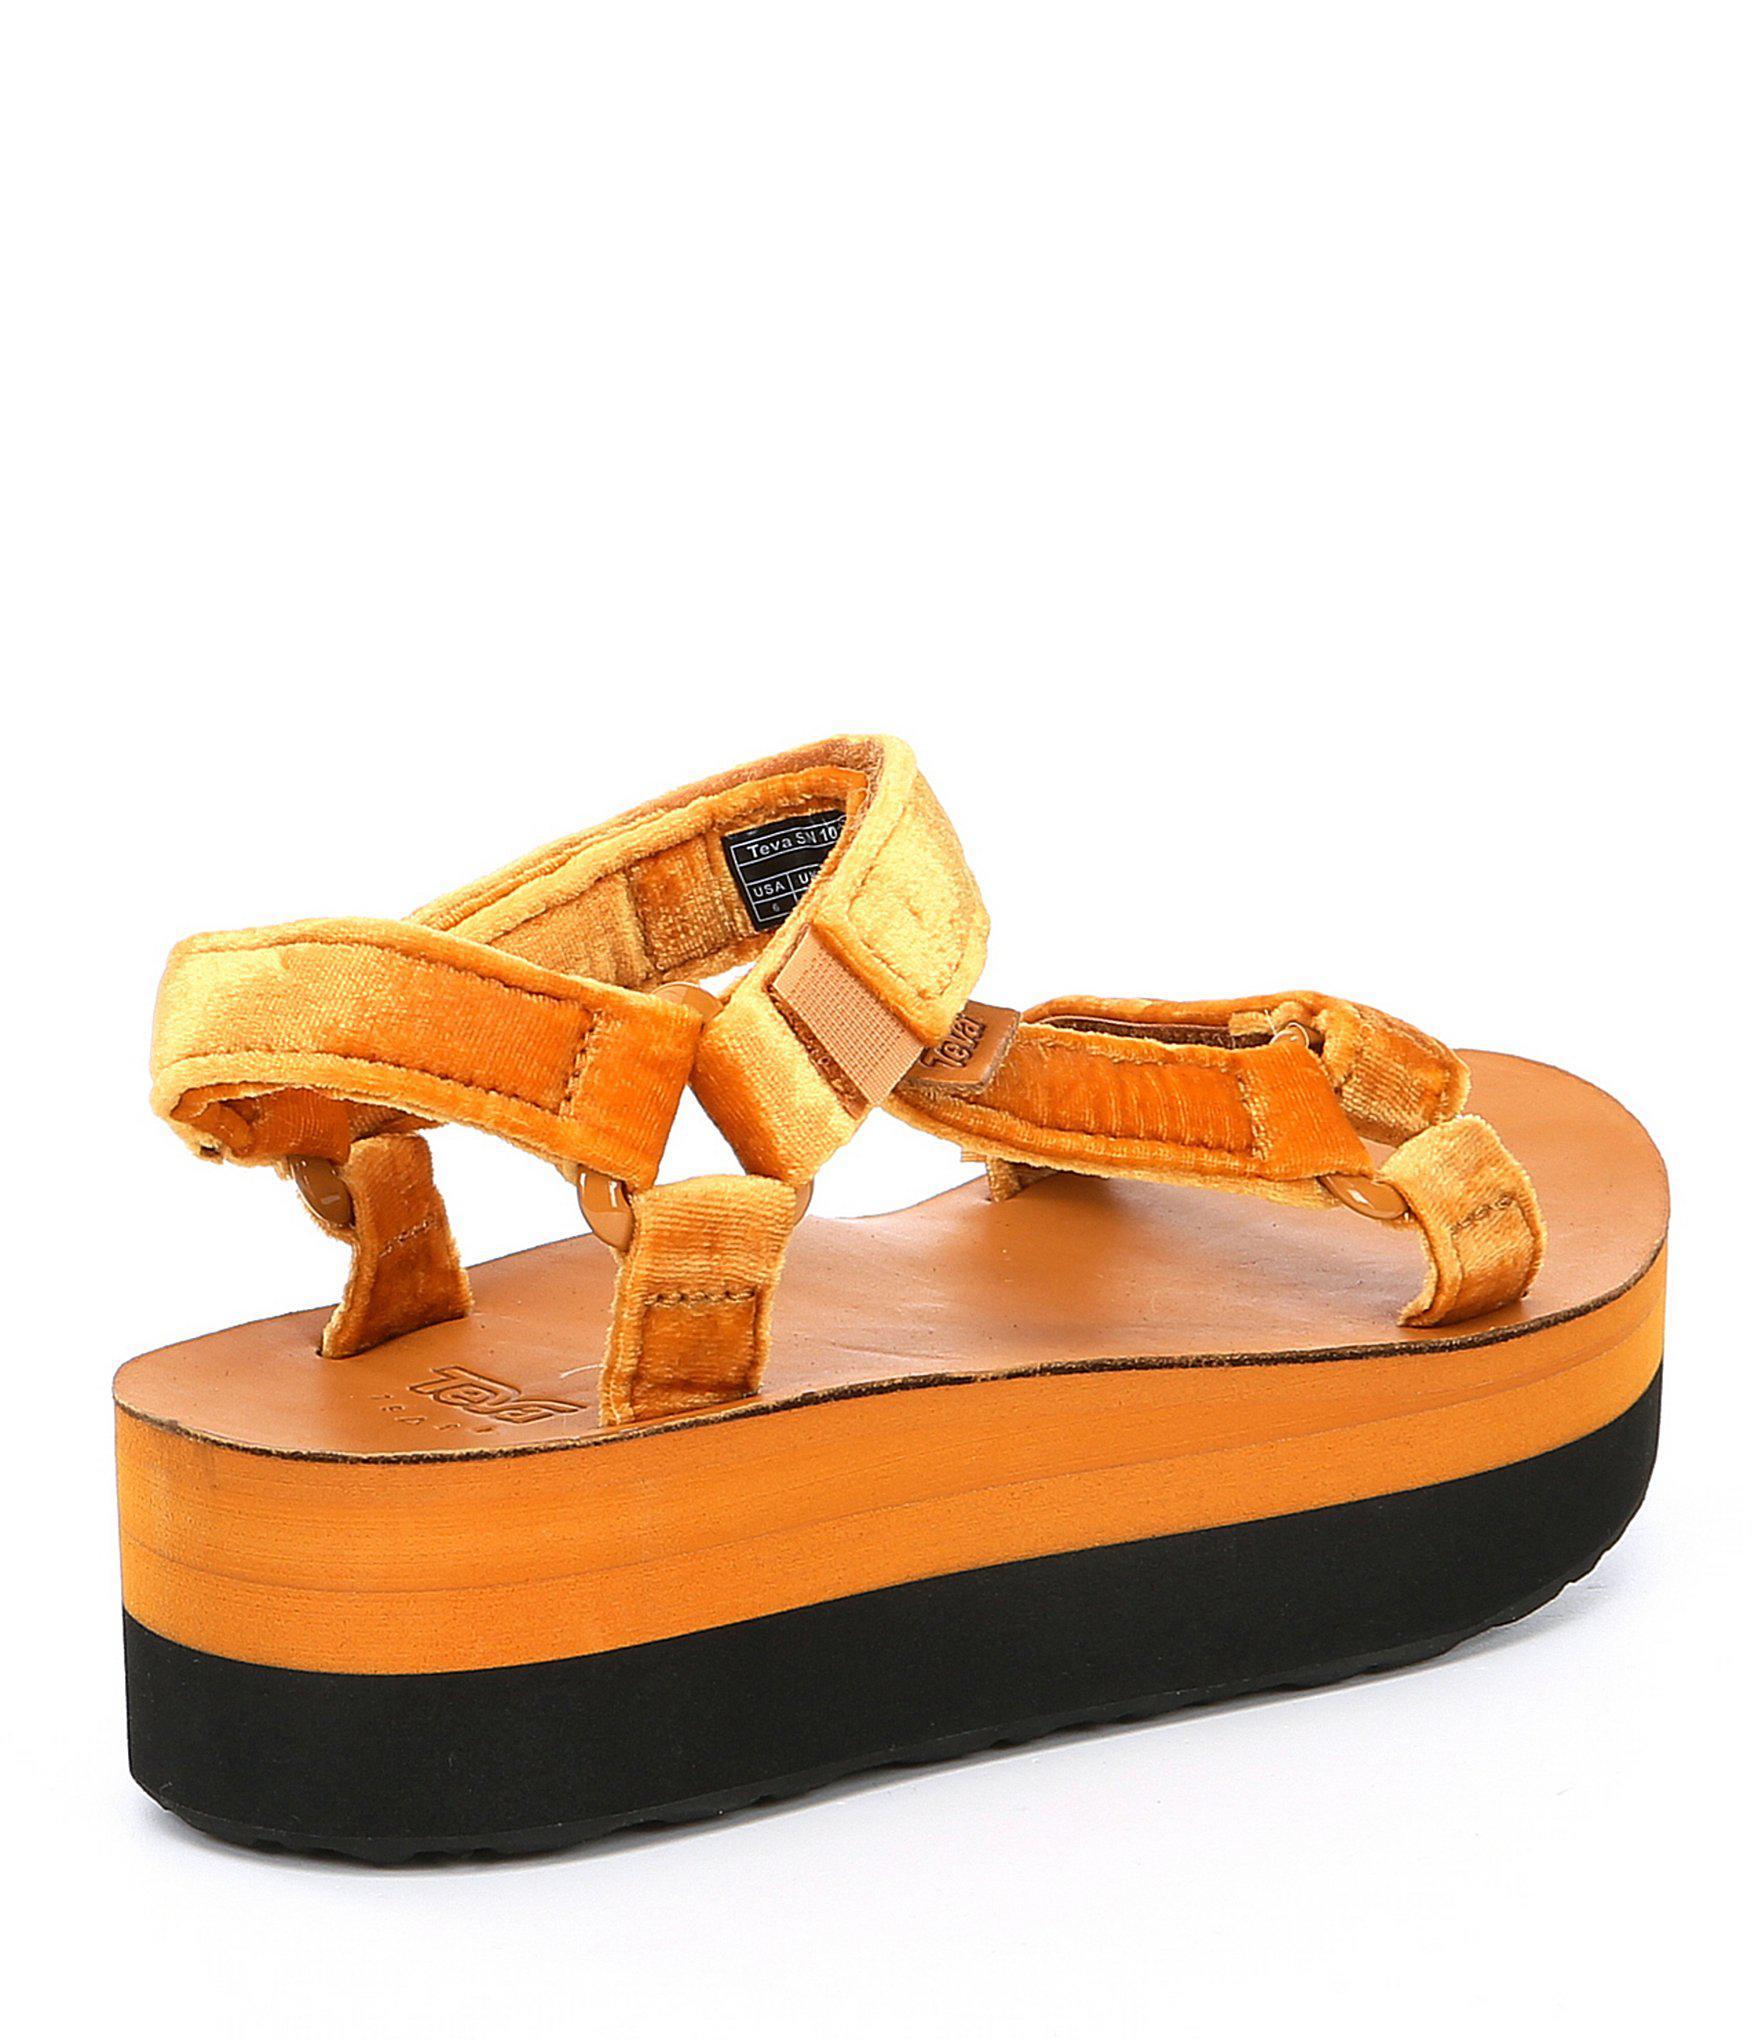 8c87c924f06 Lyst - Teva Flatform Universal Velvet Platform Sandal in Brown